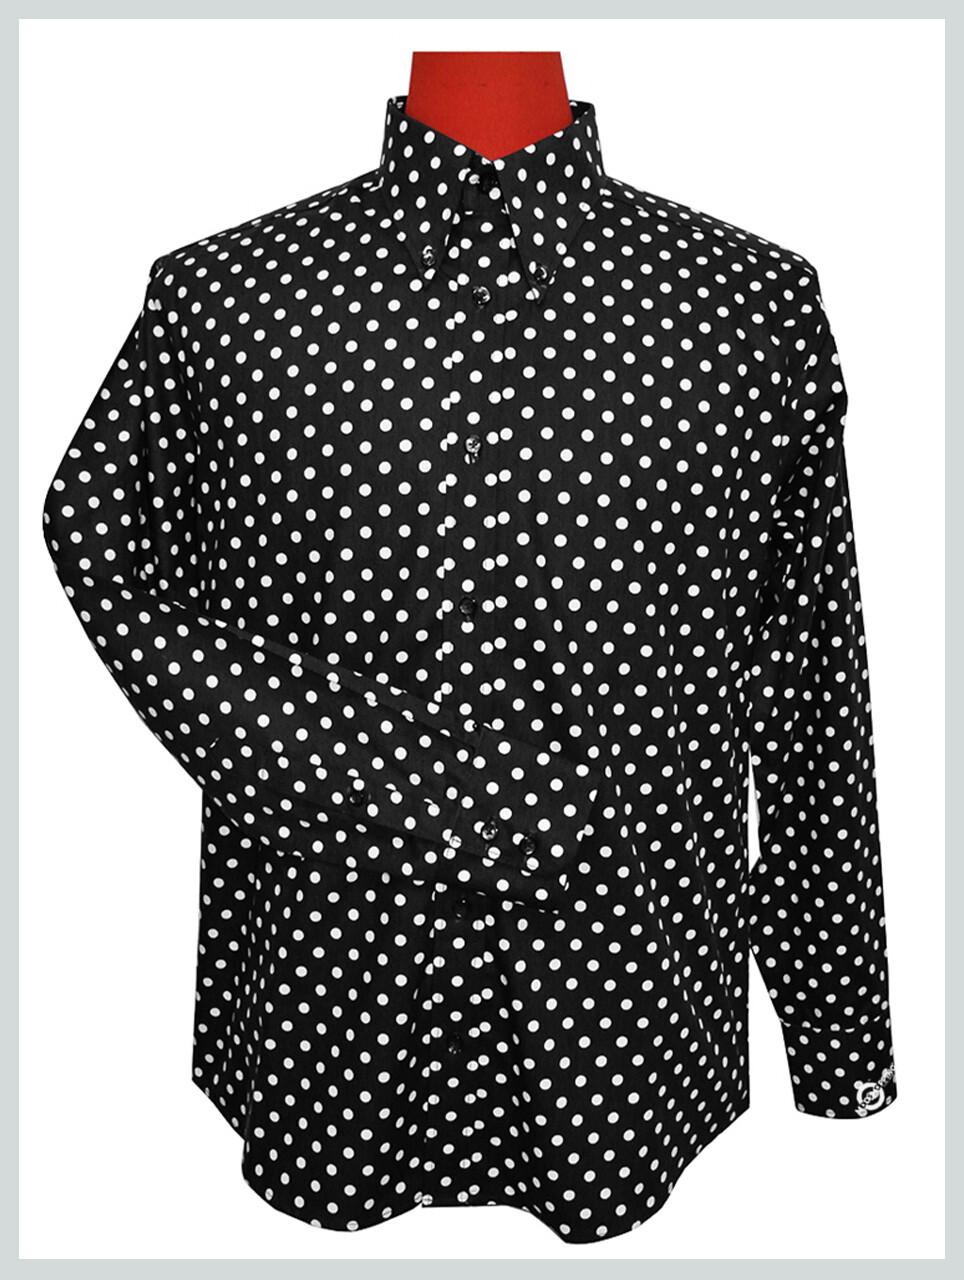 Polka Dot Shirt| Mens Sim Fit Small White Dot In Black Shirt Uk